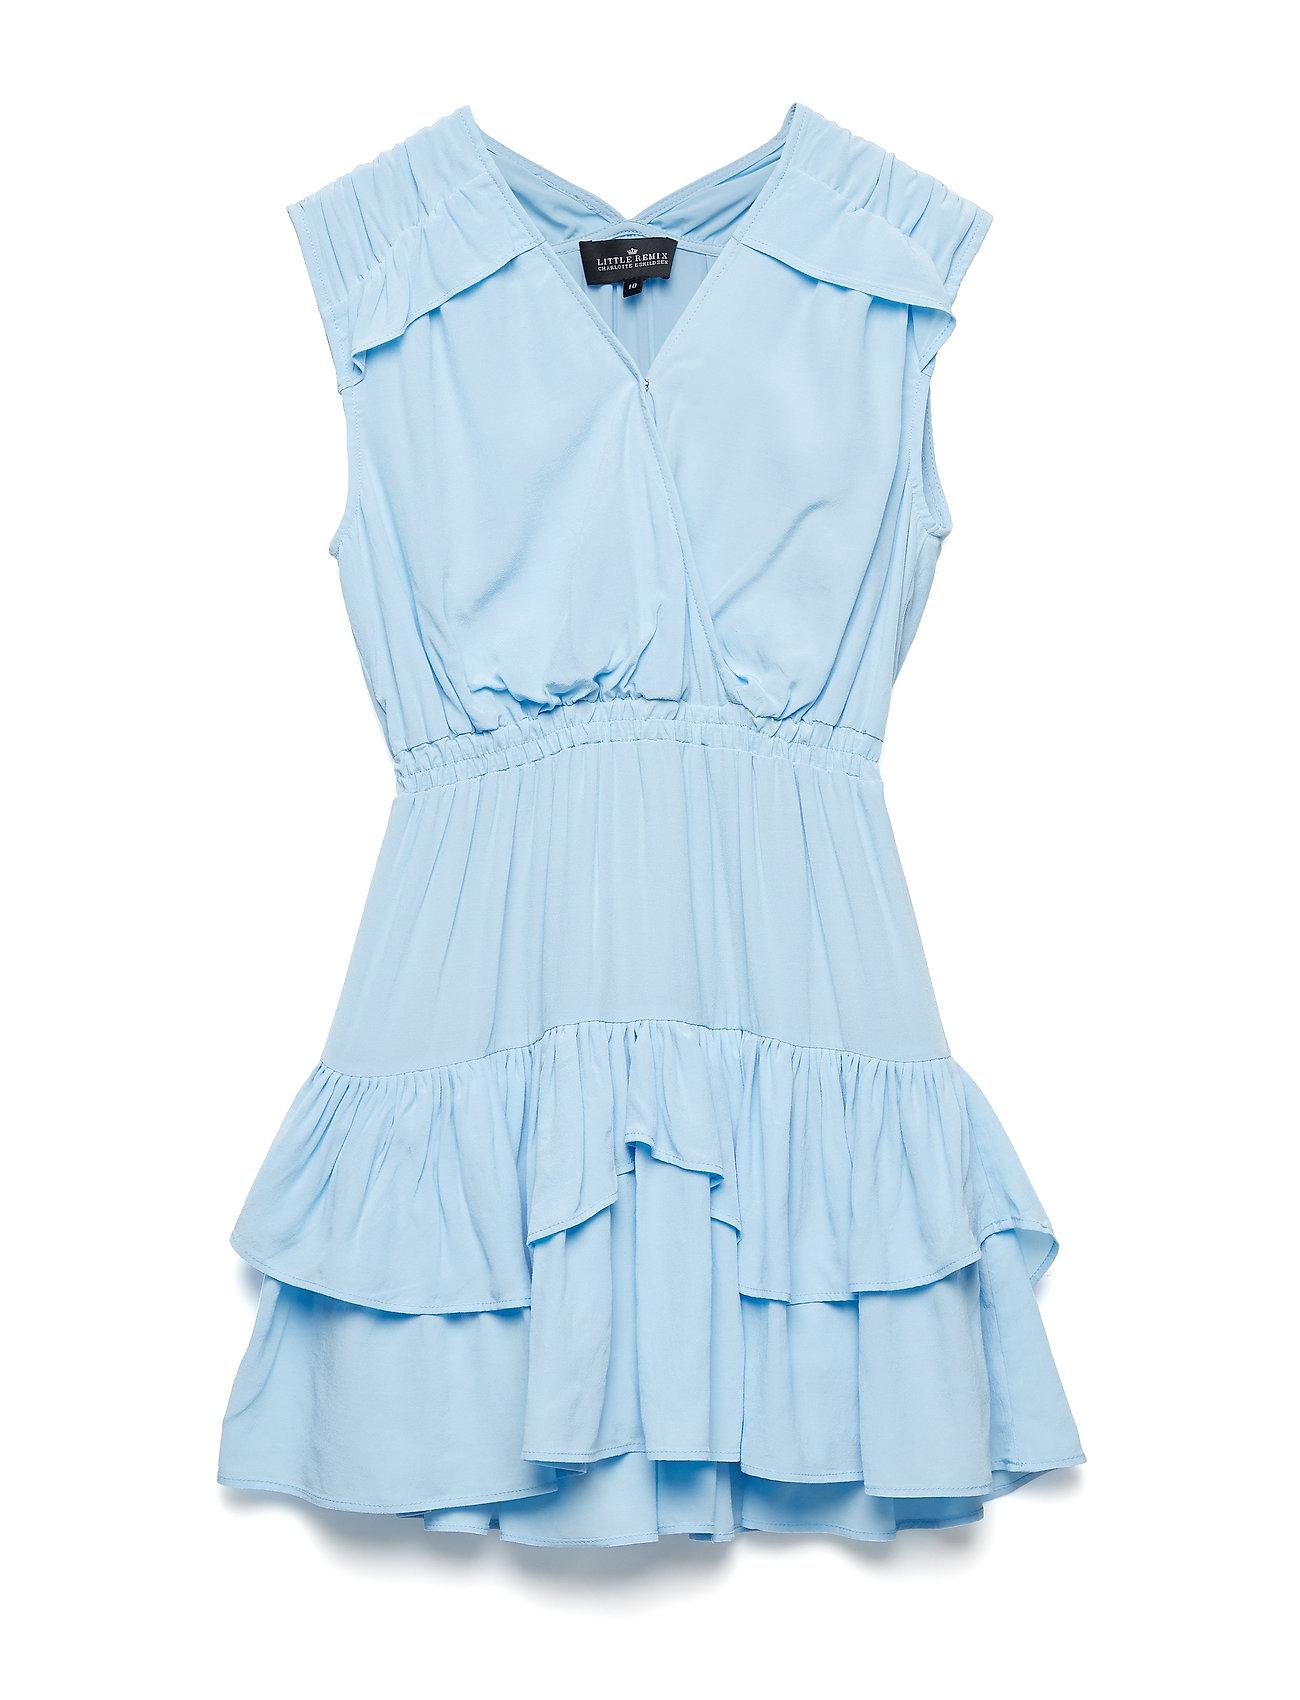 a8816b83595a Sort Little Remix Lr Nini Ruffle Dress kjoler for børn - Pashion.dk